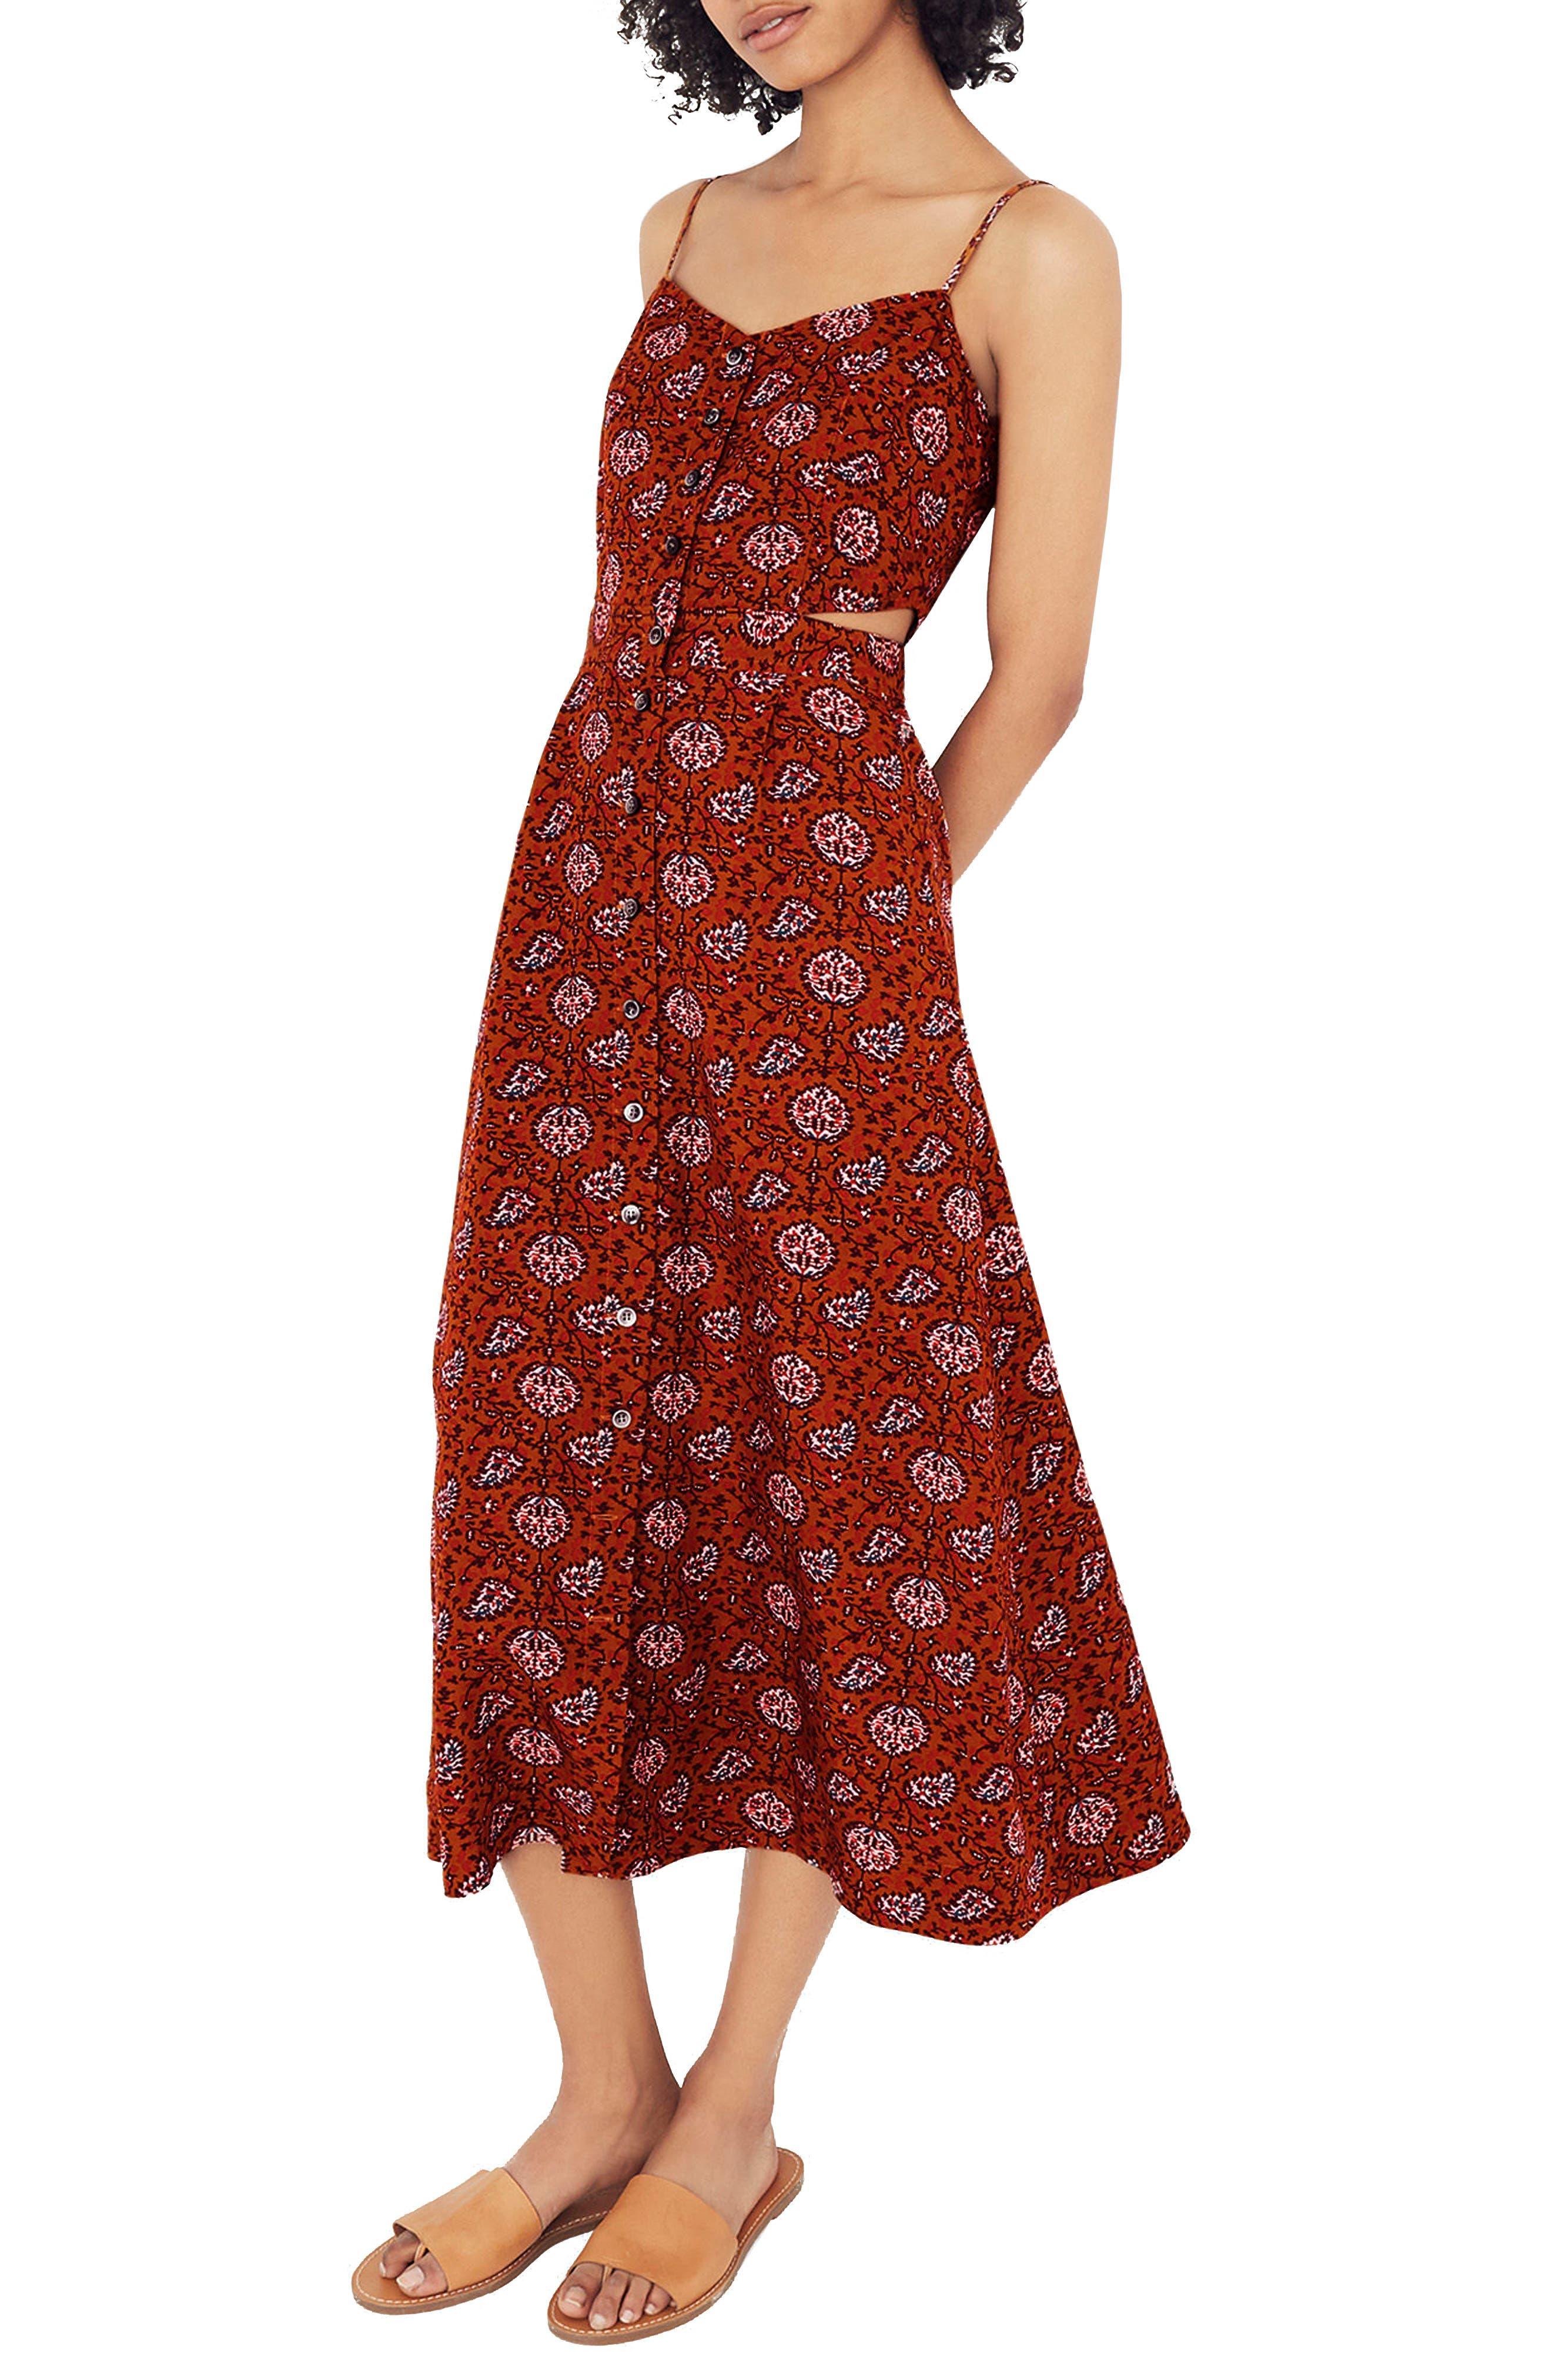 MADEWELL,                             Warm Paisley Cutout Camisole Midi Dress,                             Main thumbnail 1, color,                             200